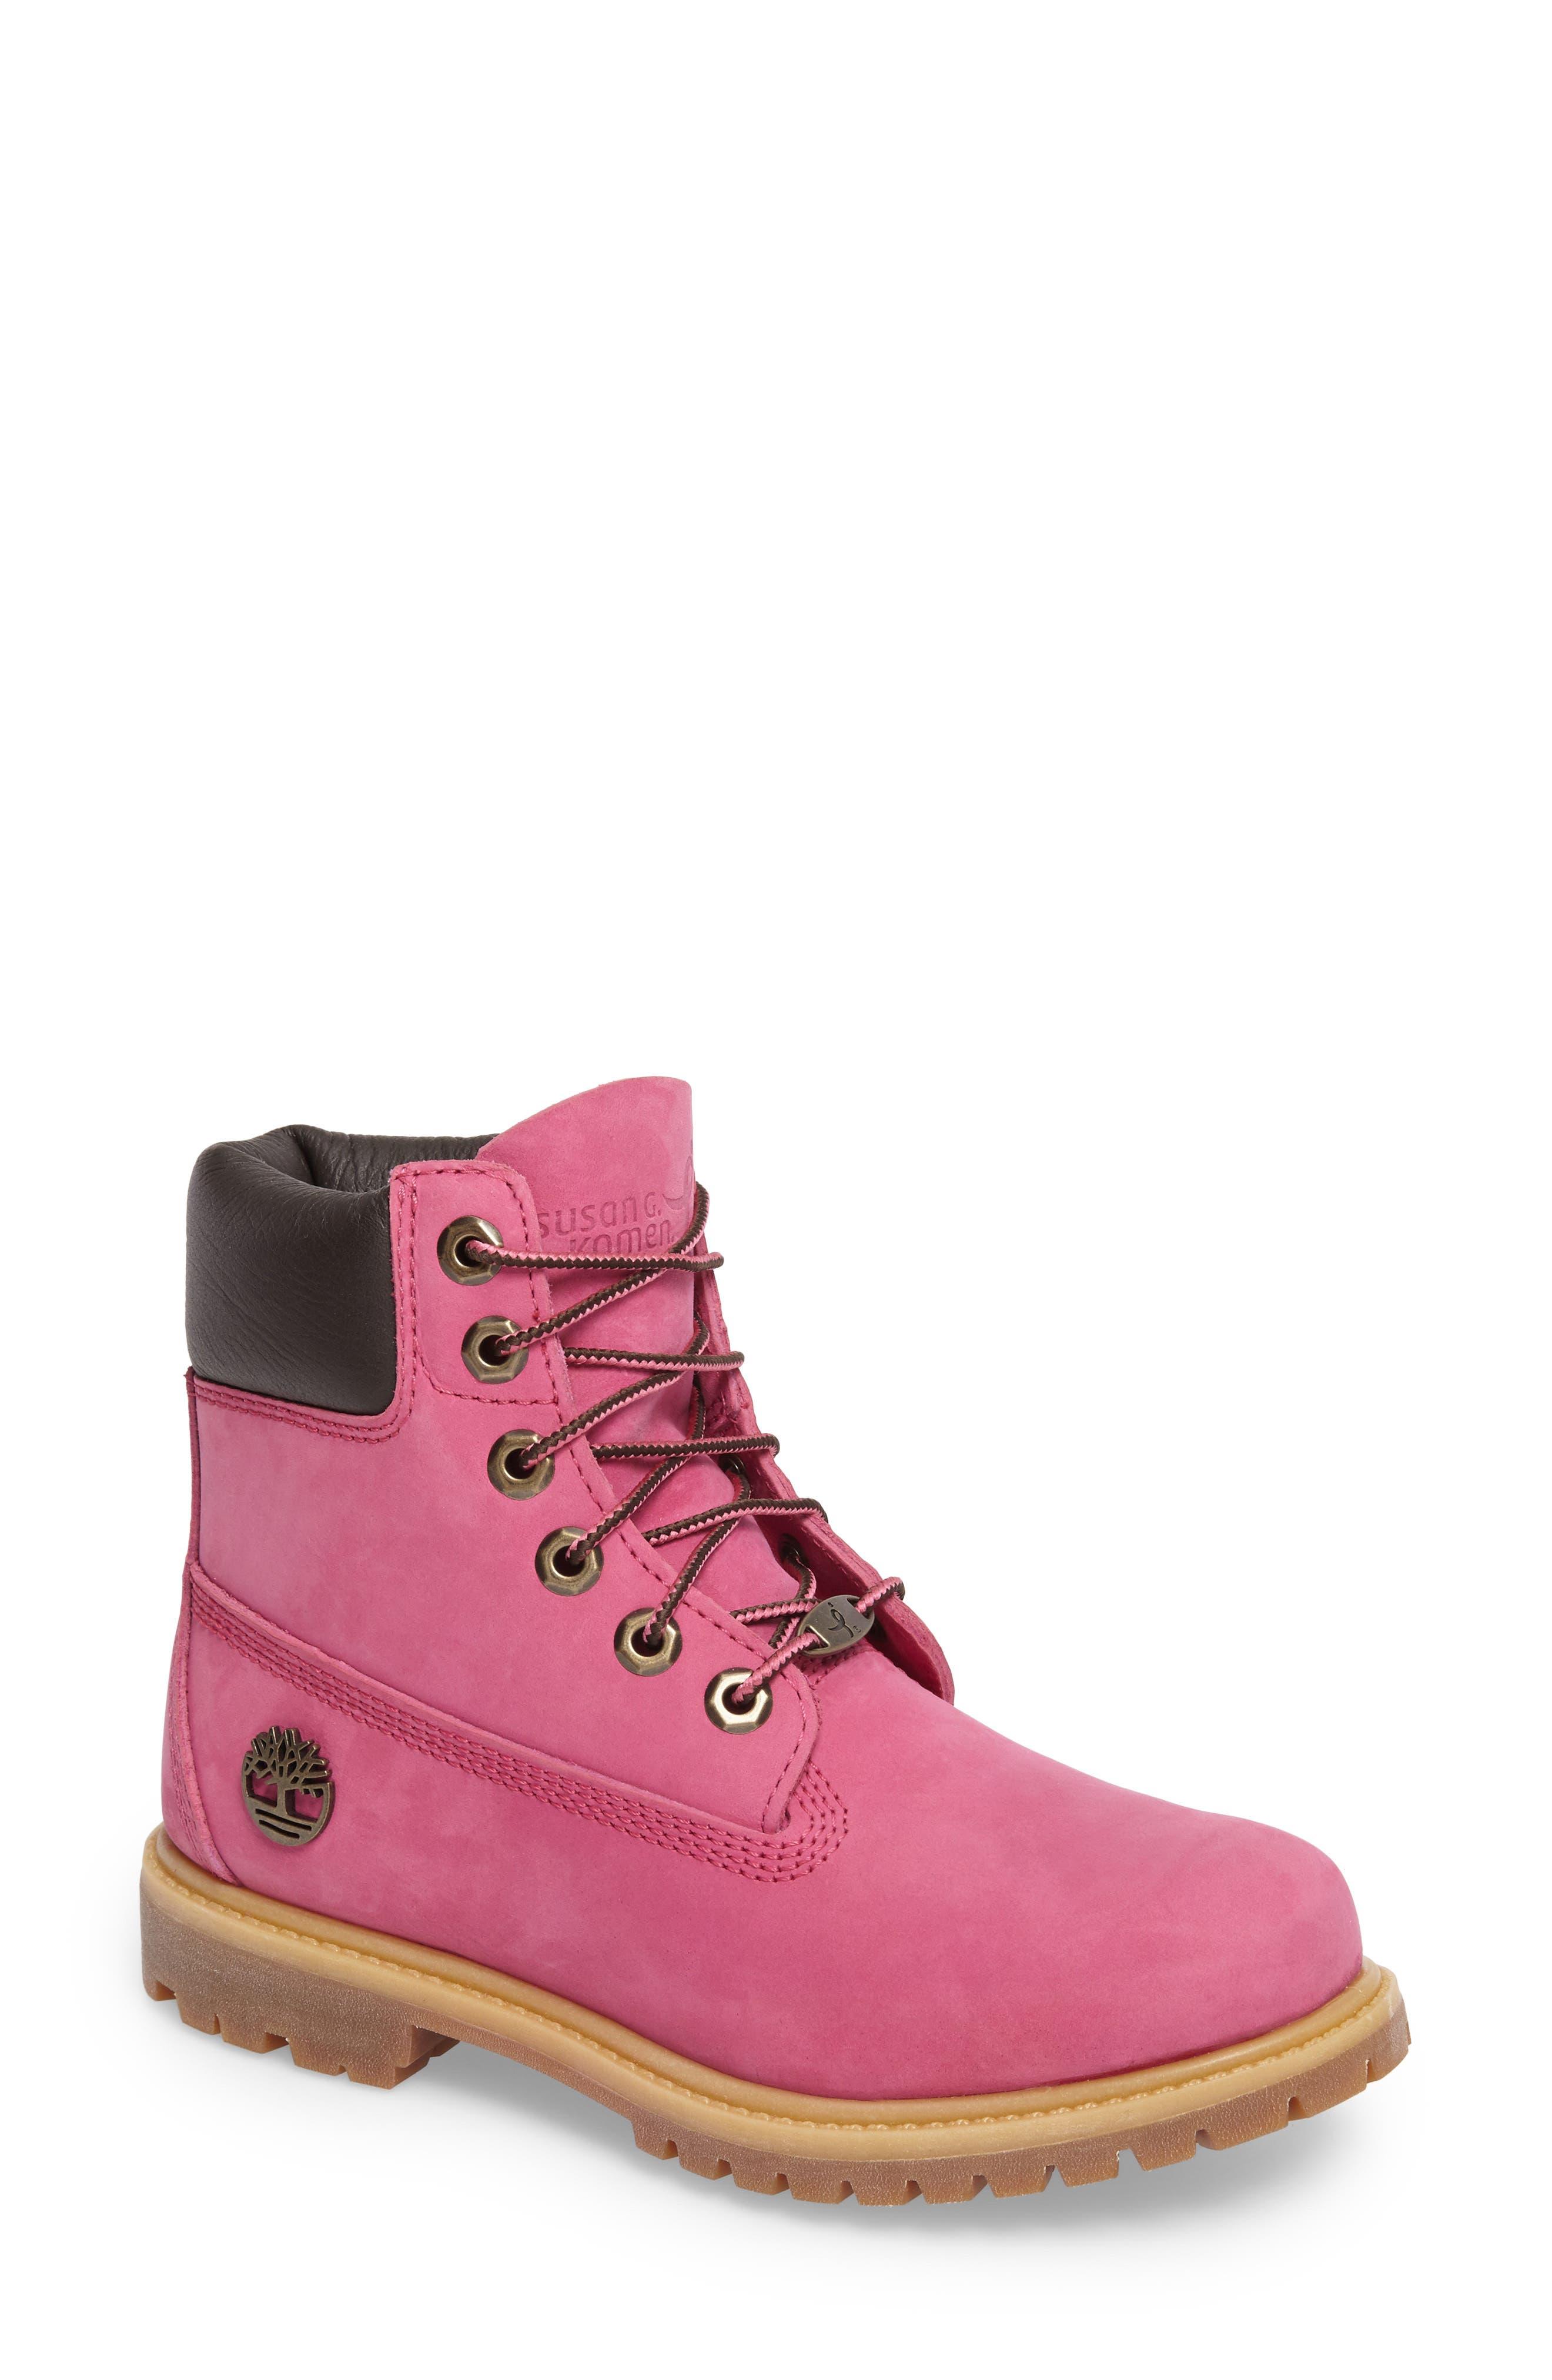 x Susan G. Komen 6-Inch Waterproof Insulated Boot,                         Main,                         color, Bright Pink Nubuck